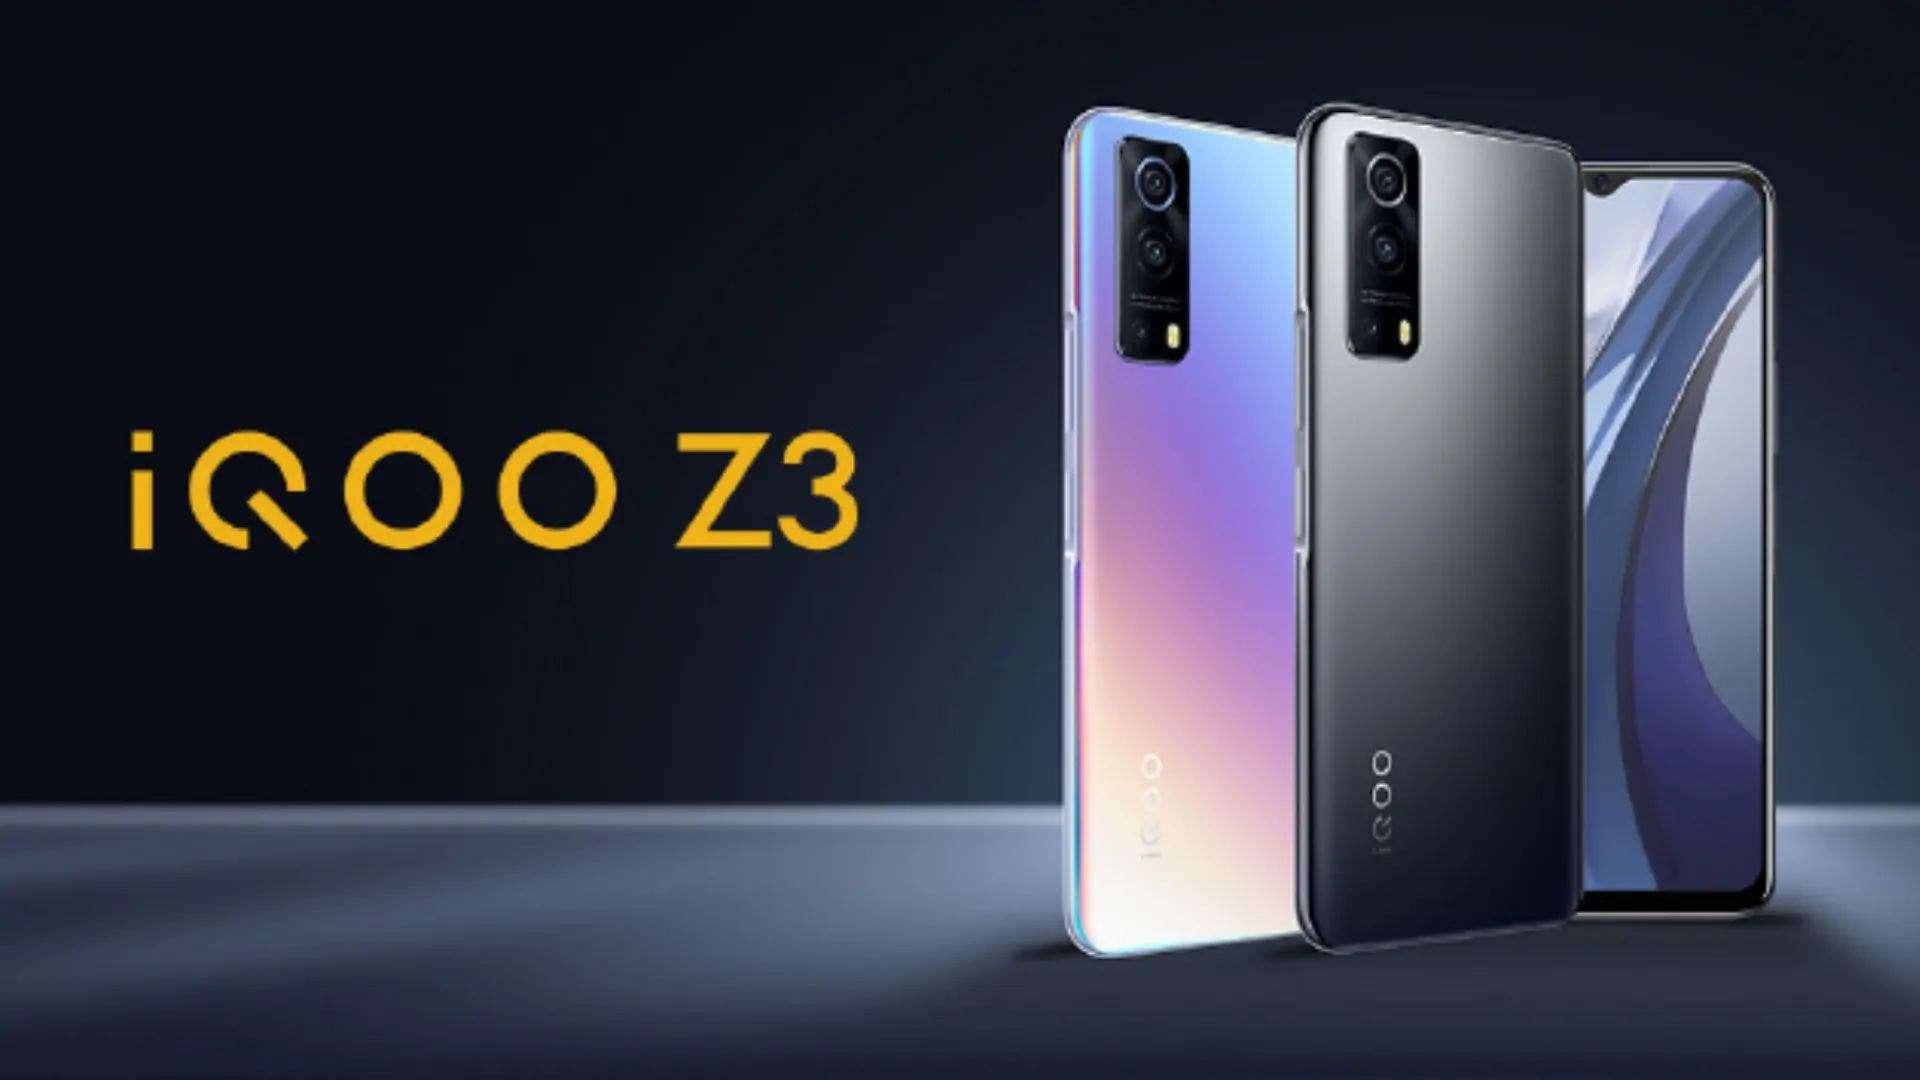 iQOO Z3 Reviews, iQOO Z3 the Best Camera Picture iQOO Z3 Screen Guide, iQOO Z3 testing, iQOO Z3 replacement Reviews